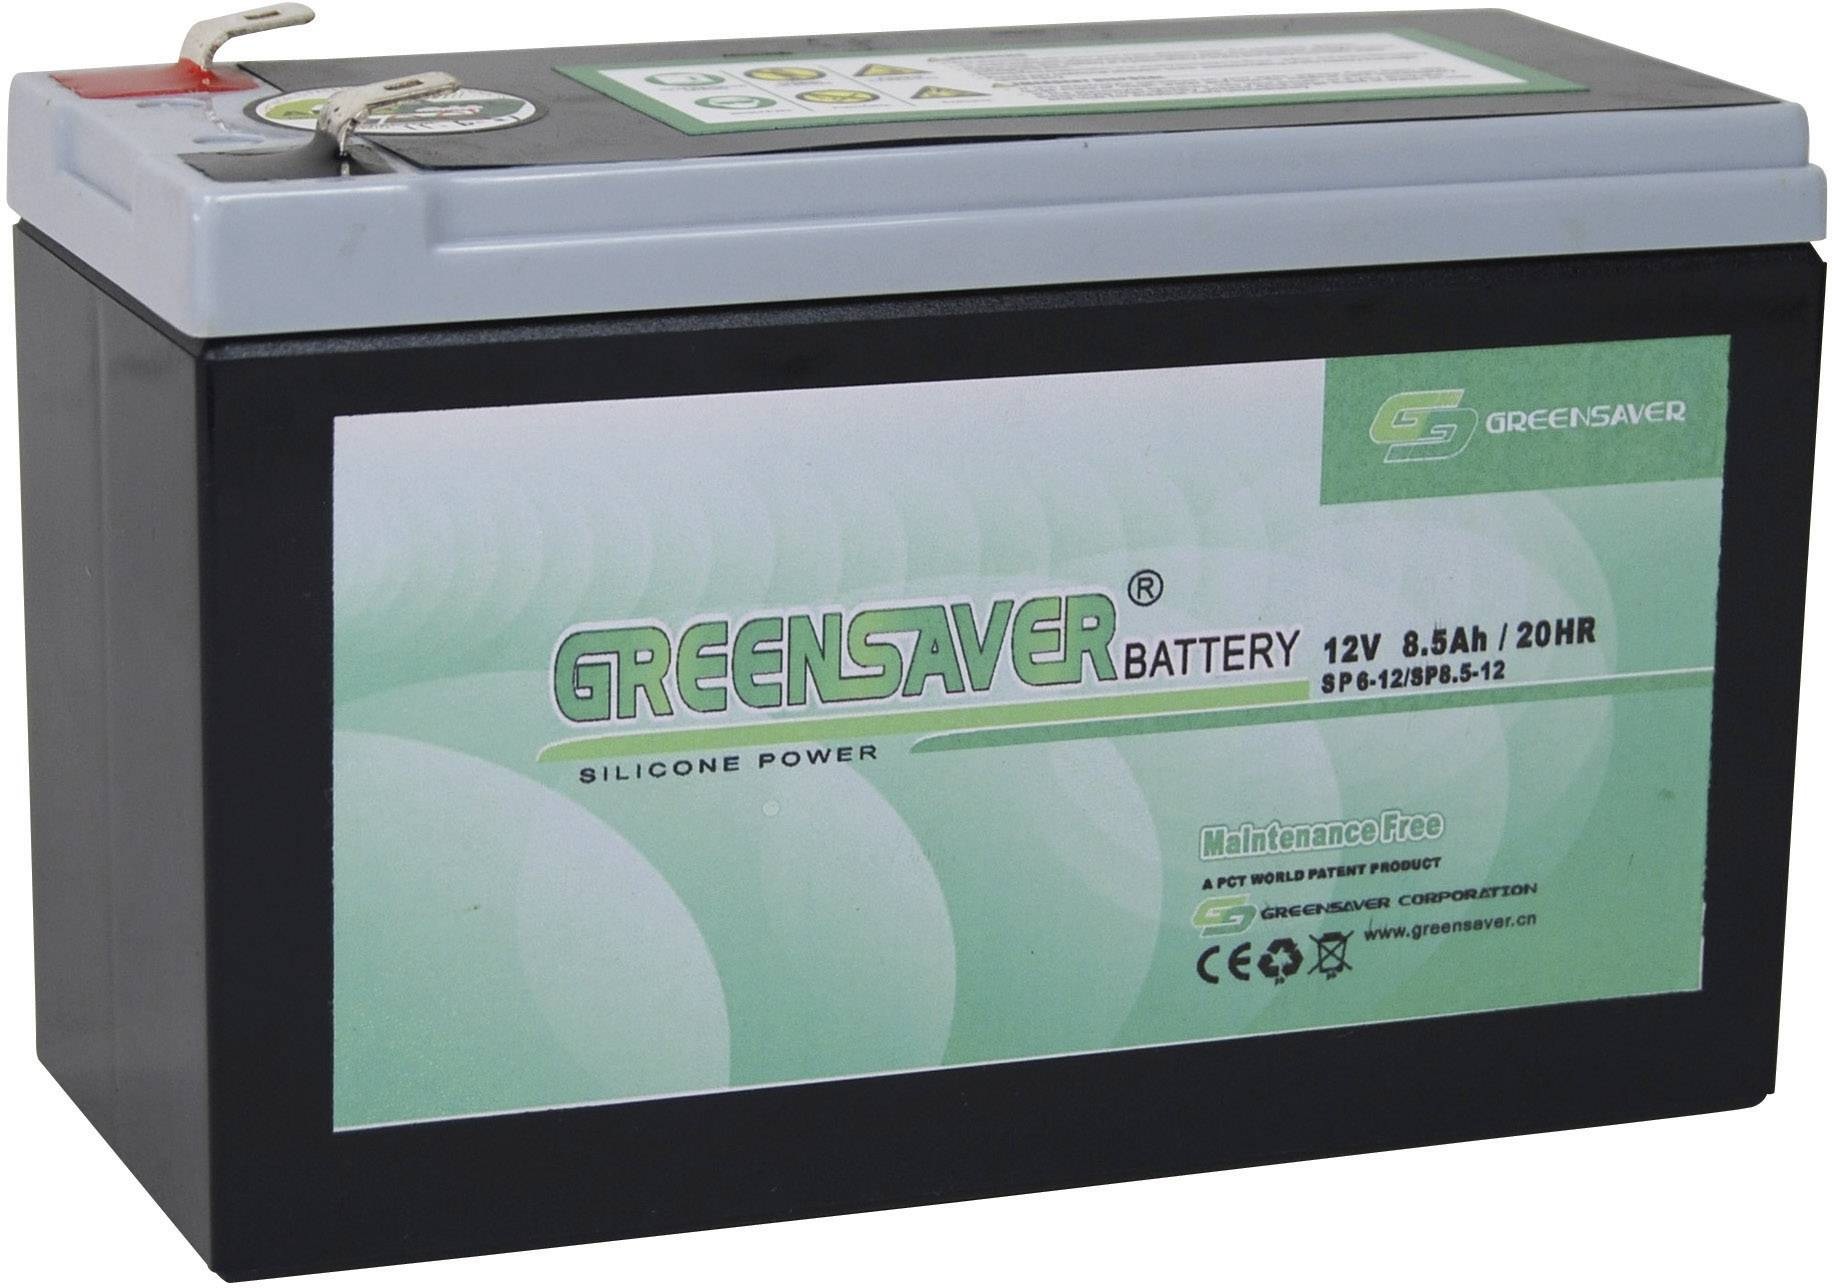 Olovený akumulátor Greensaver SP8.5-12, SP6-12 SP6-12/SP8.5-12, 8.5 Ah, 12 V